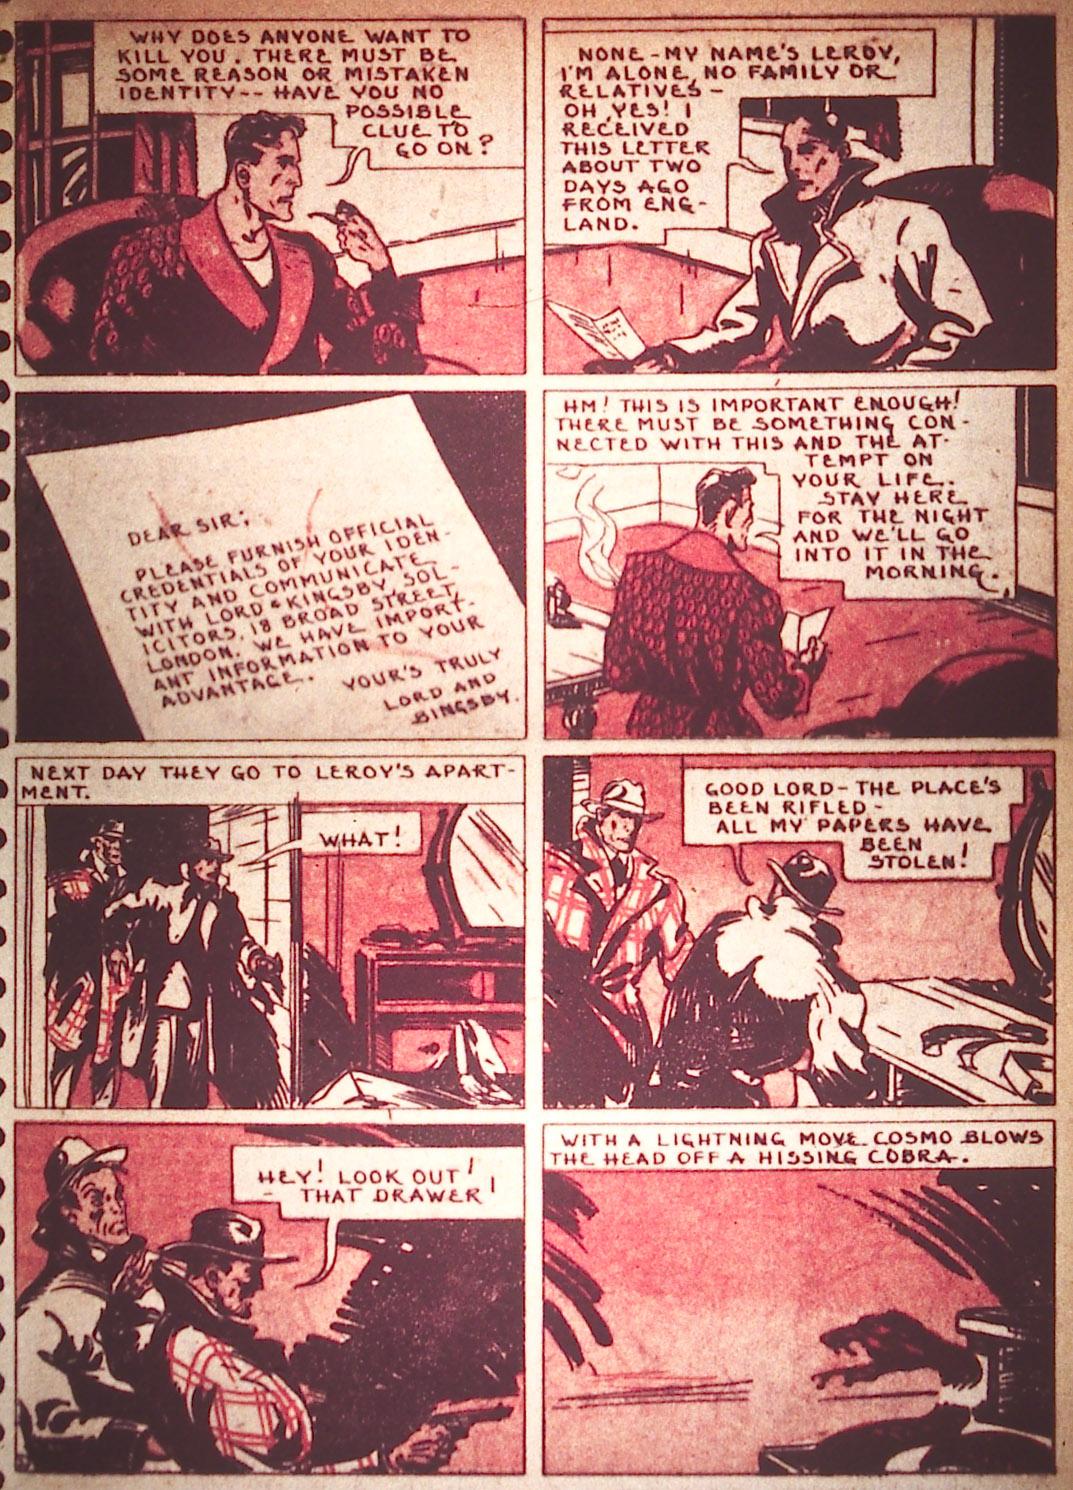 Detective Comics (1937) 23 Page 48